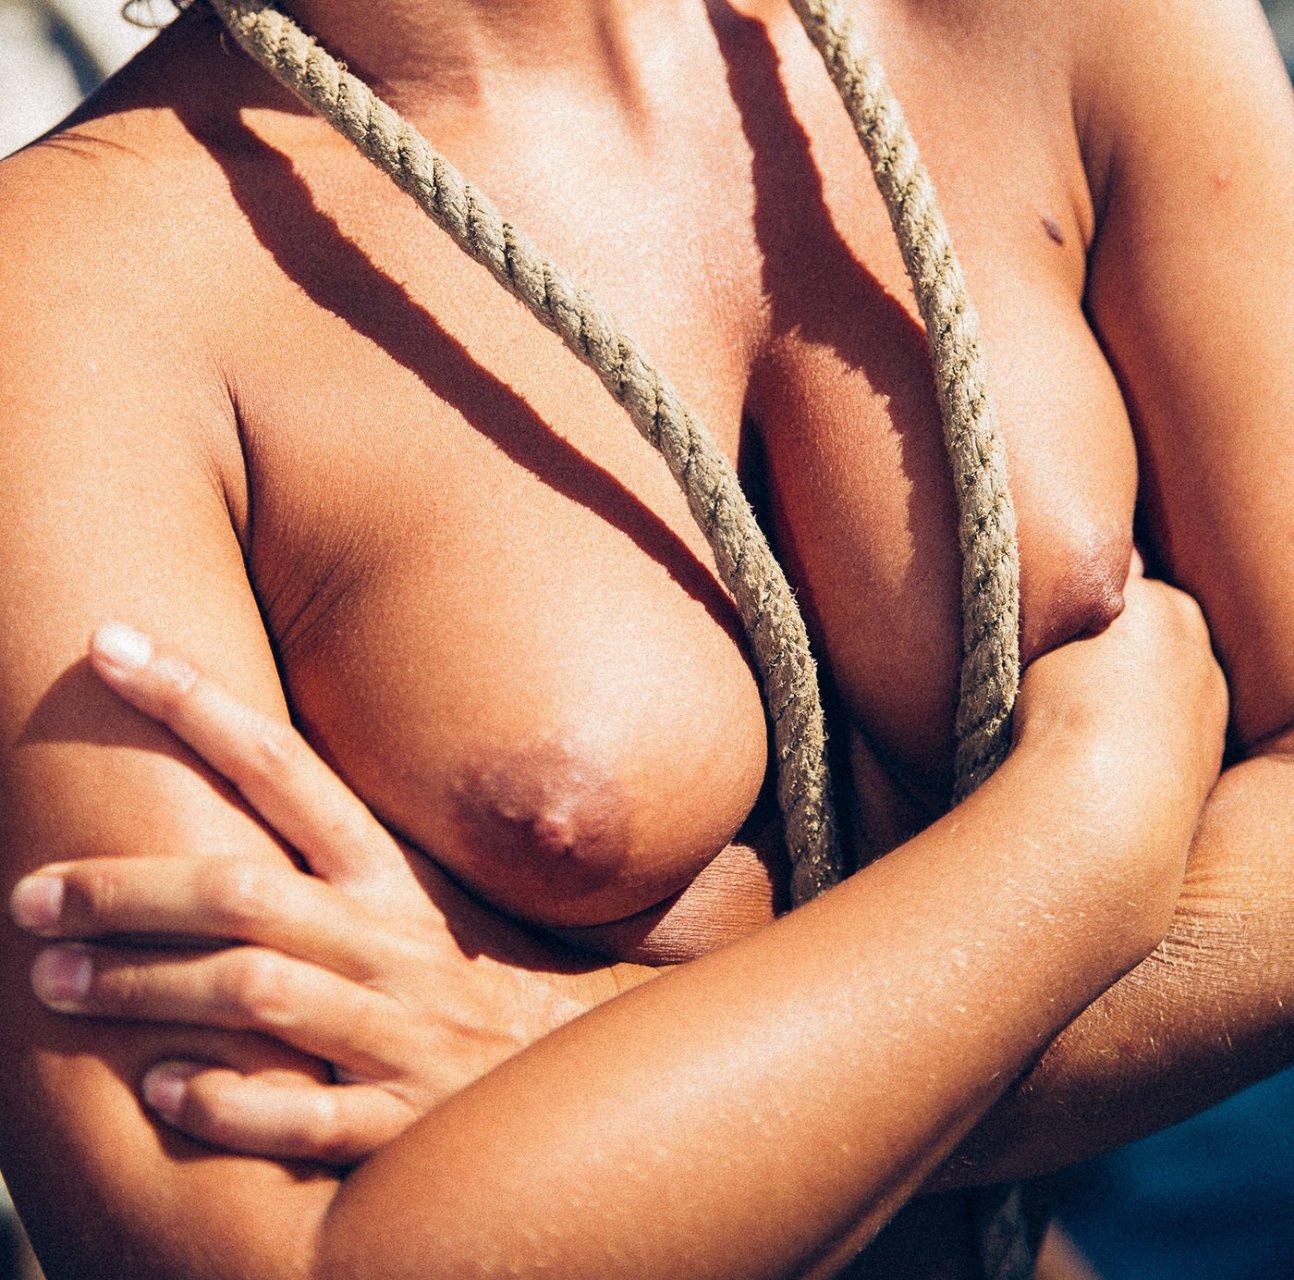 Gabriela france tattoo Erotic pics & movies Andrea smidt by mikkel kristensen mq photo shoot,Lina Esco hot